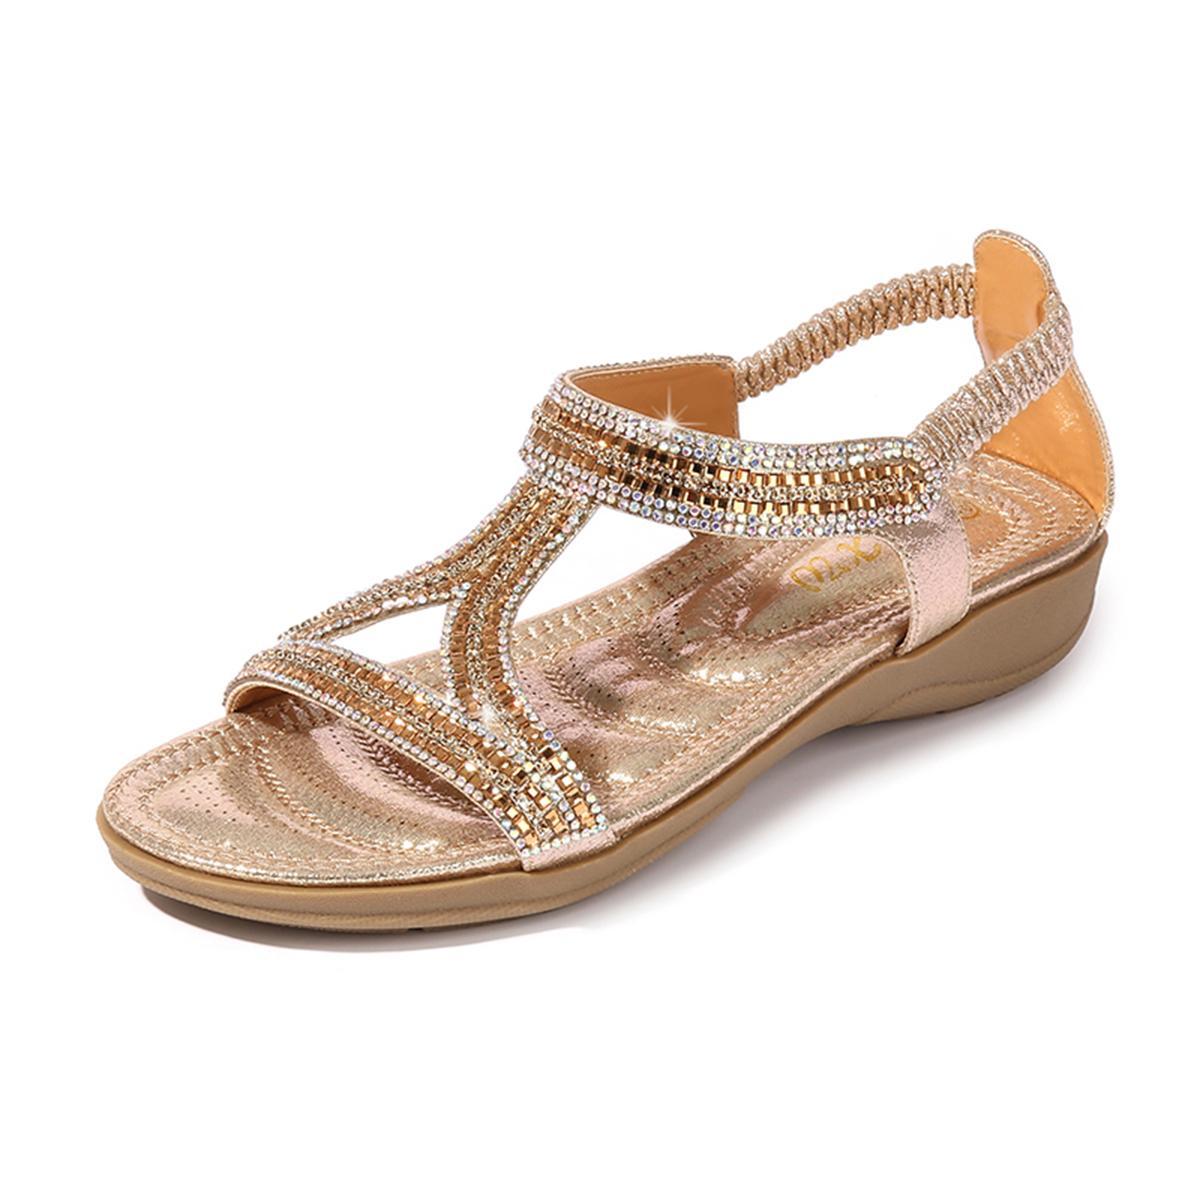 Frauen Schuhe Hausschuhe Gelegenheitsspiele Strand Sandalen Rutschfeste Modisch